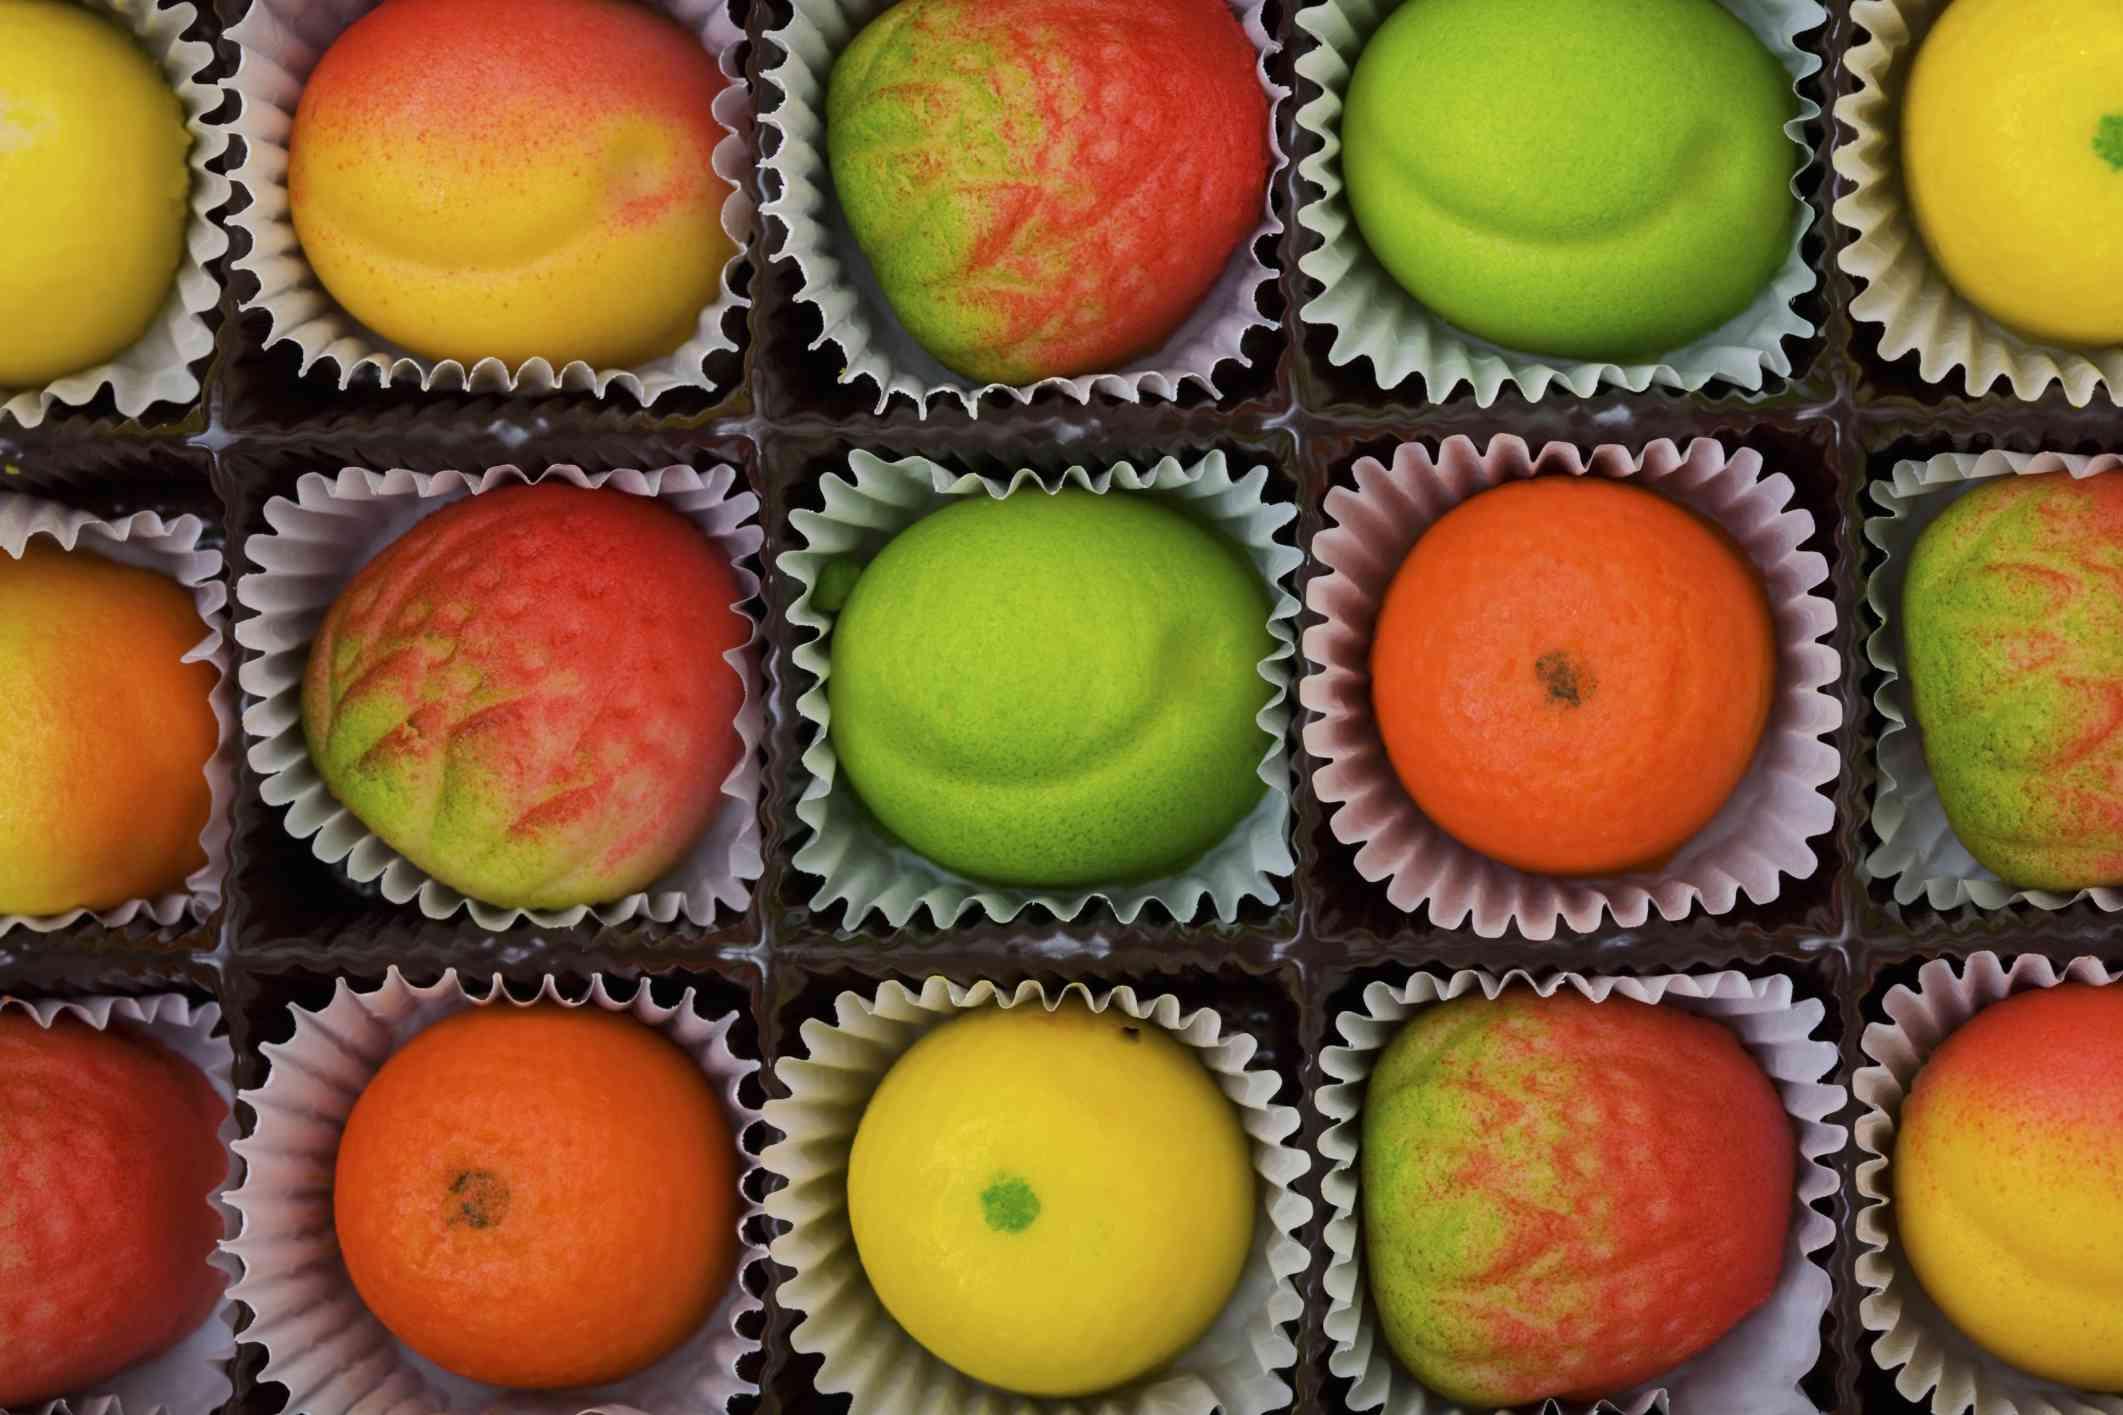 Marzipan fruit candies